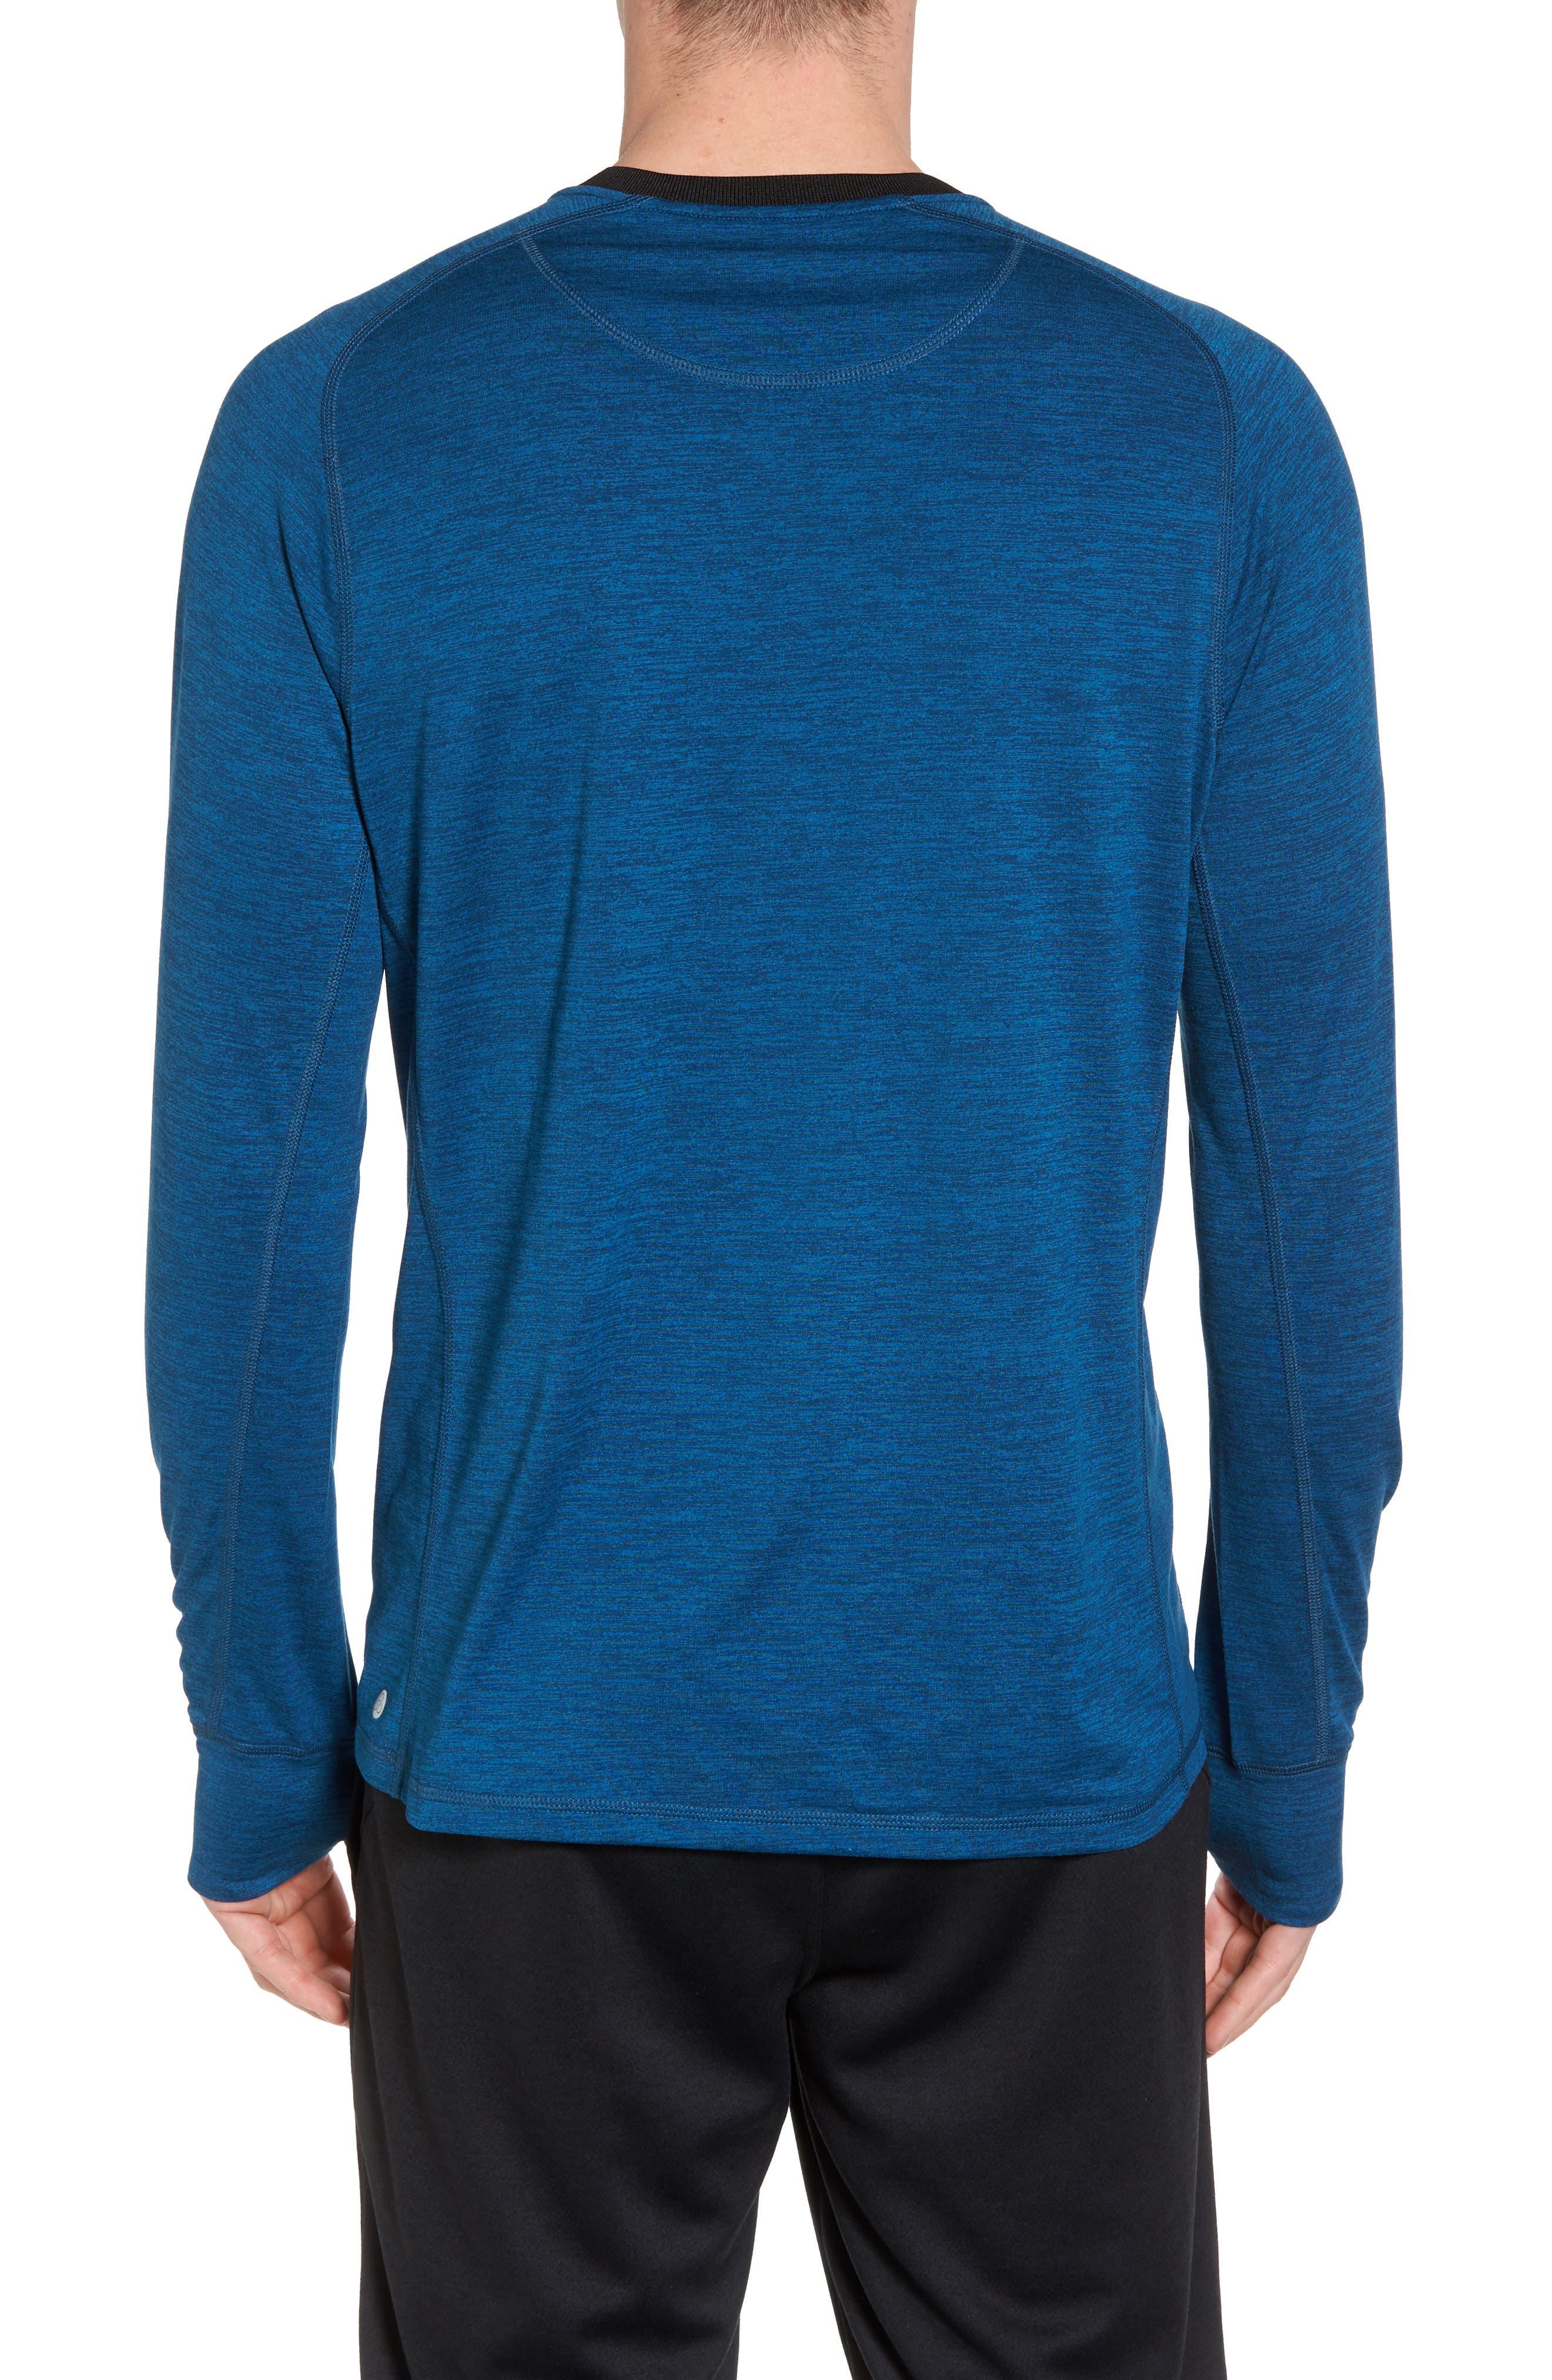 Larosite Athletic Fit T-Shirt,                             Alternate thumbnail 2, color,                             Blue Iolite Melange